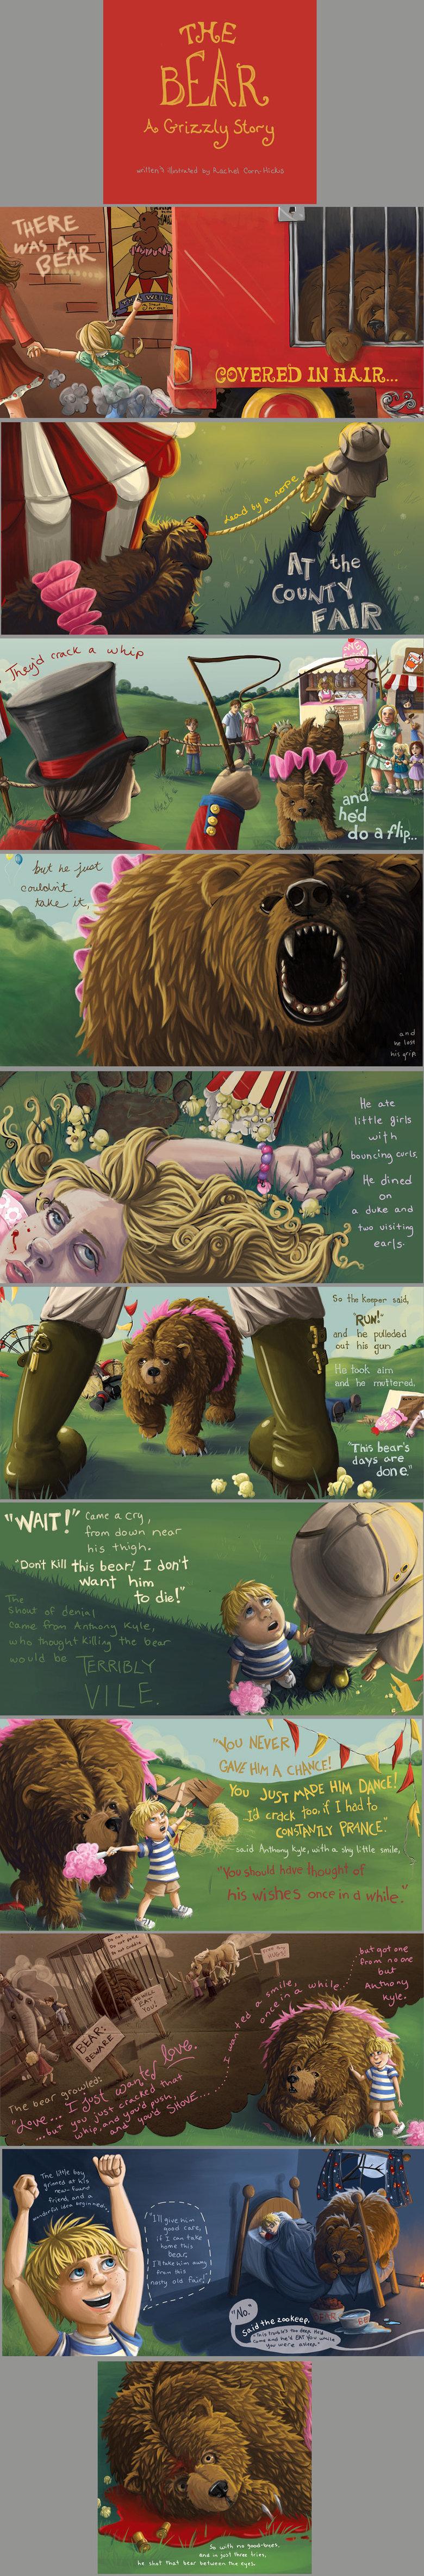 Bear. credit in content. THE BEAR. A Ciro:. z. b Suva Wynn a\. w. vaa by Tot he , This Bear' s days are Euan down _ Doria MII This bear! I atlant ham V Cr, 'tgi